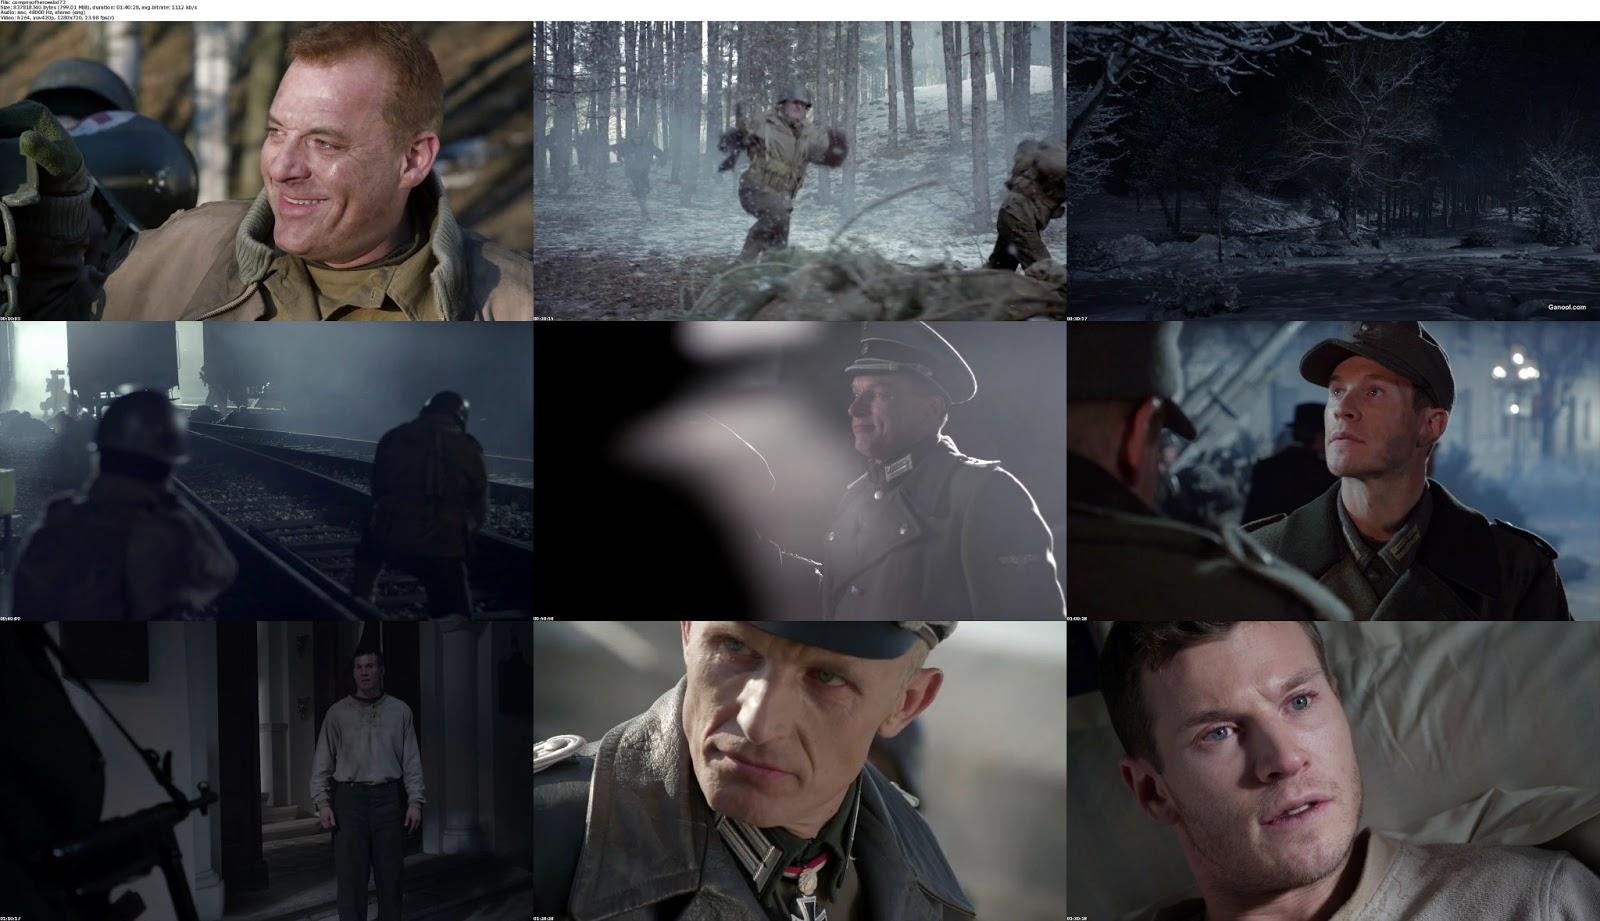 Company+Of+Heroes+(2013)+BluRay+720p+BRRip+800MB+Hnmovies